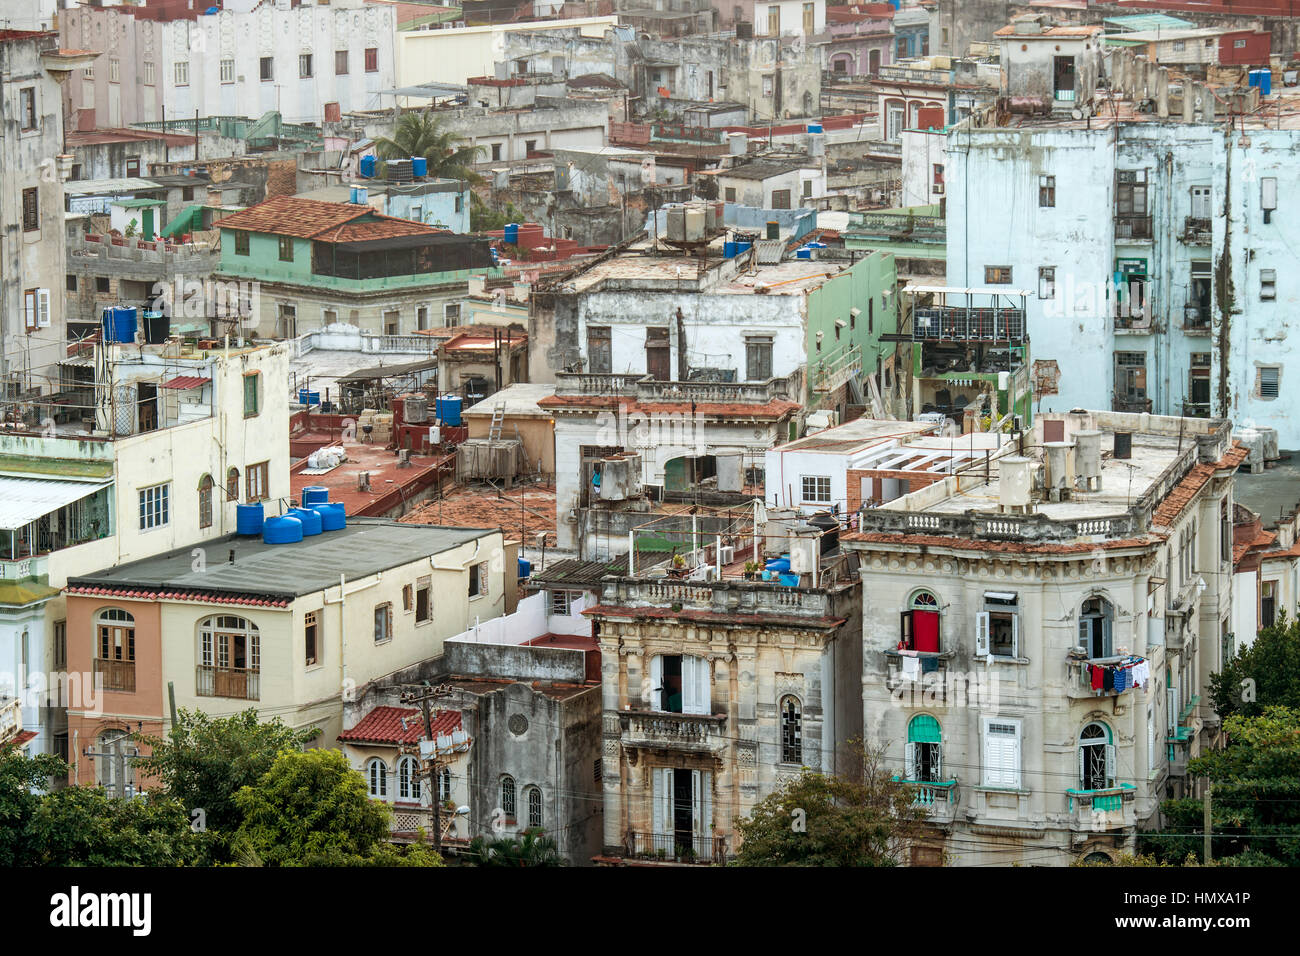 Cuba - Stock Image